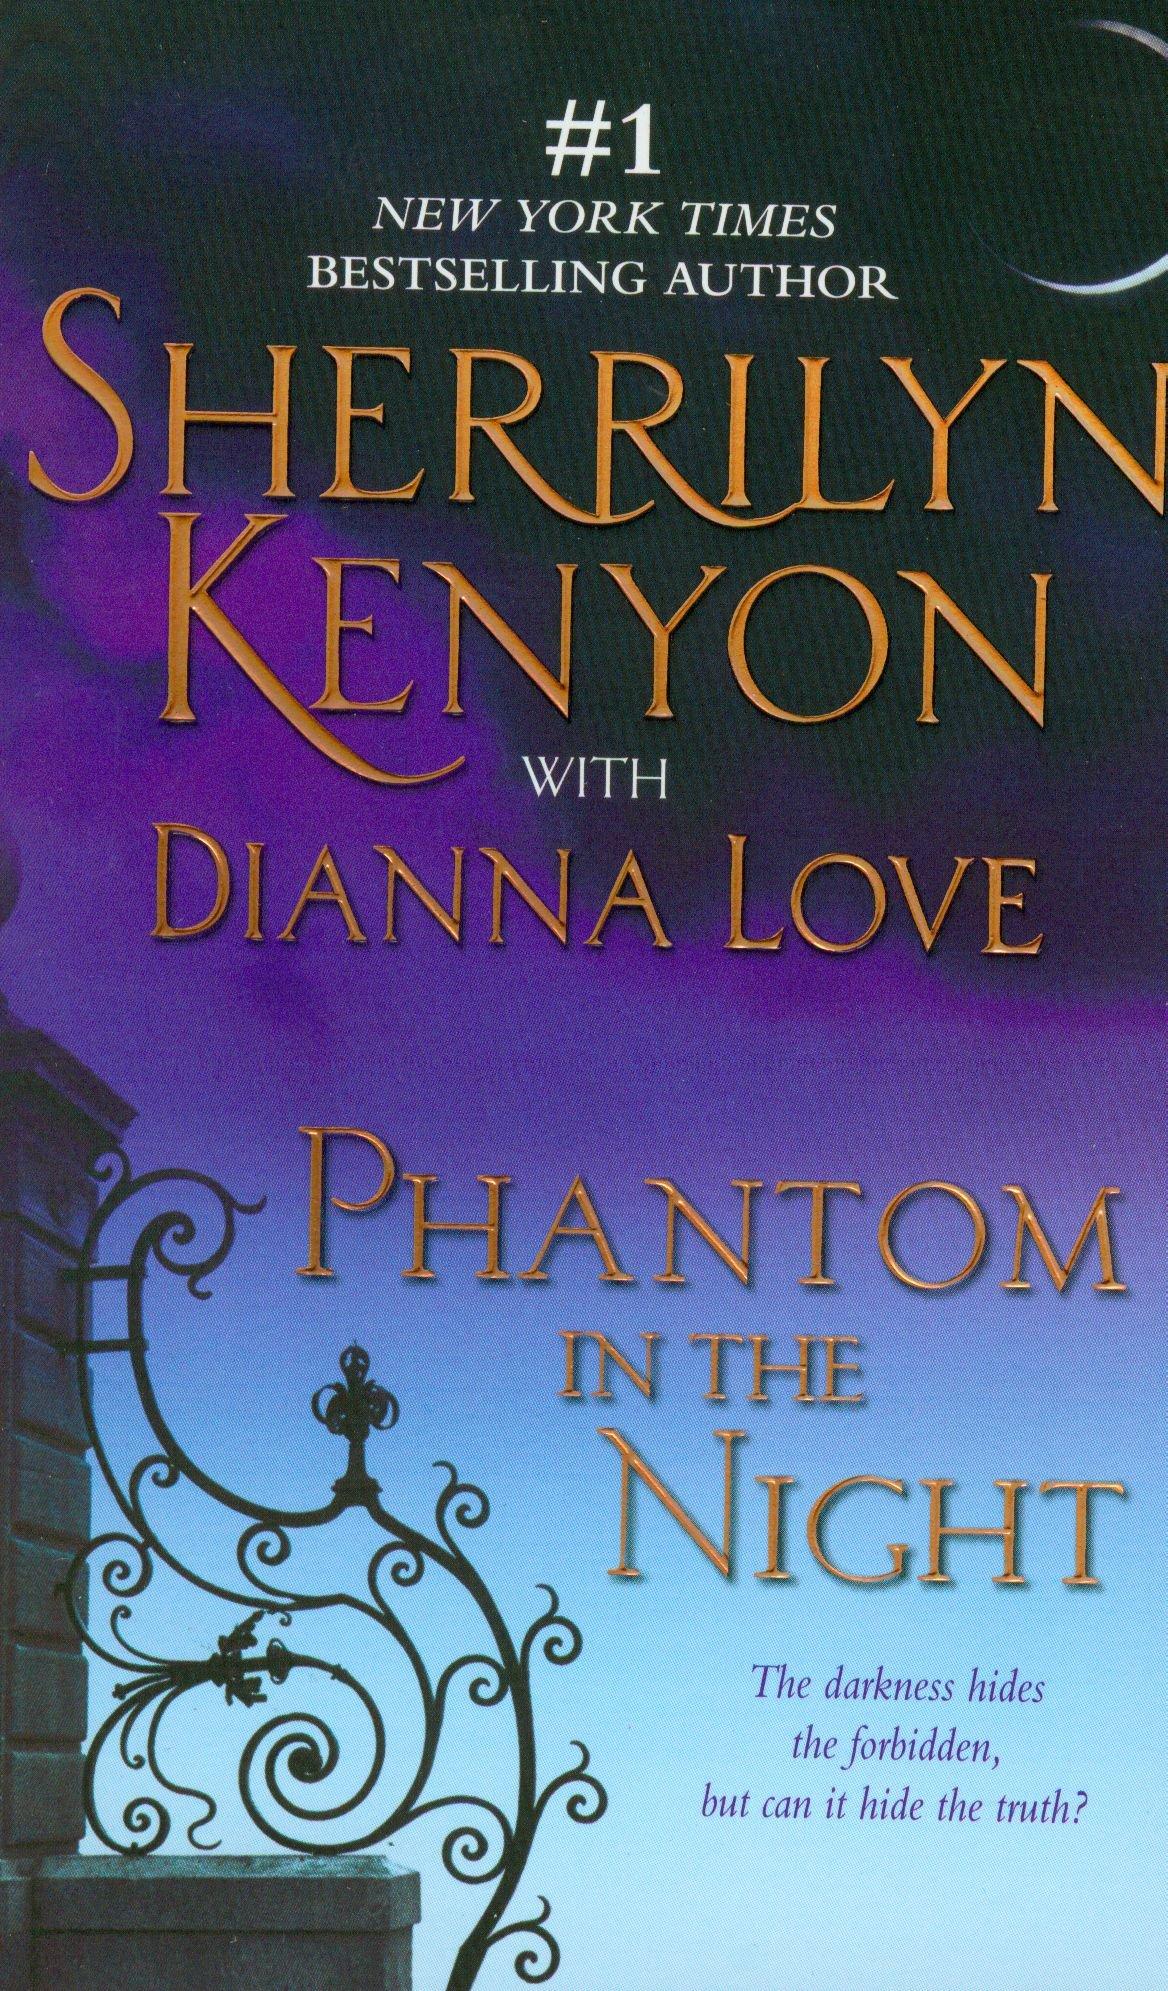 Download Phantom in the Night (B.a.d. Agency) PDF Text fb2 ebook